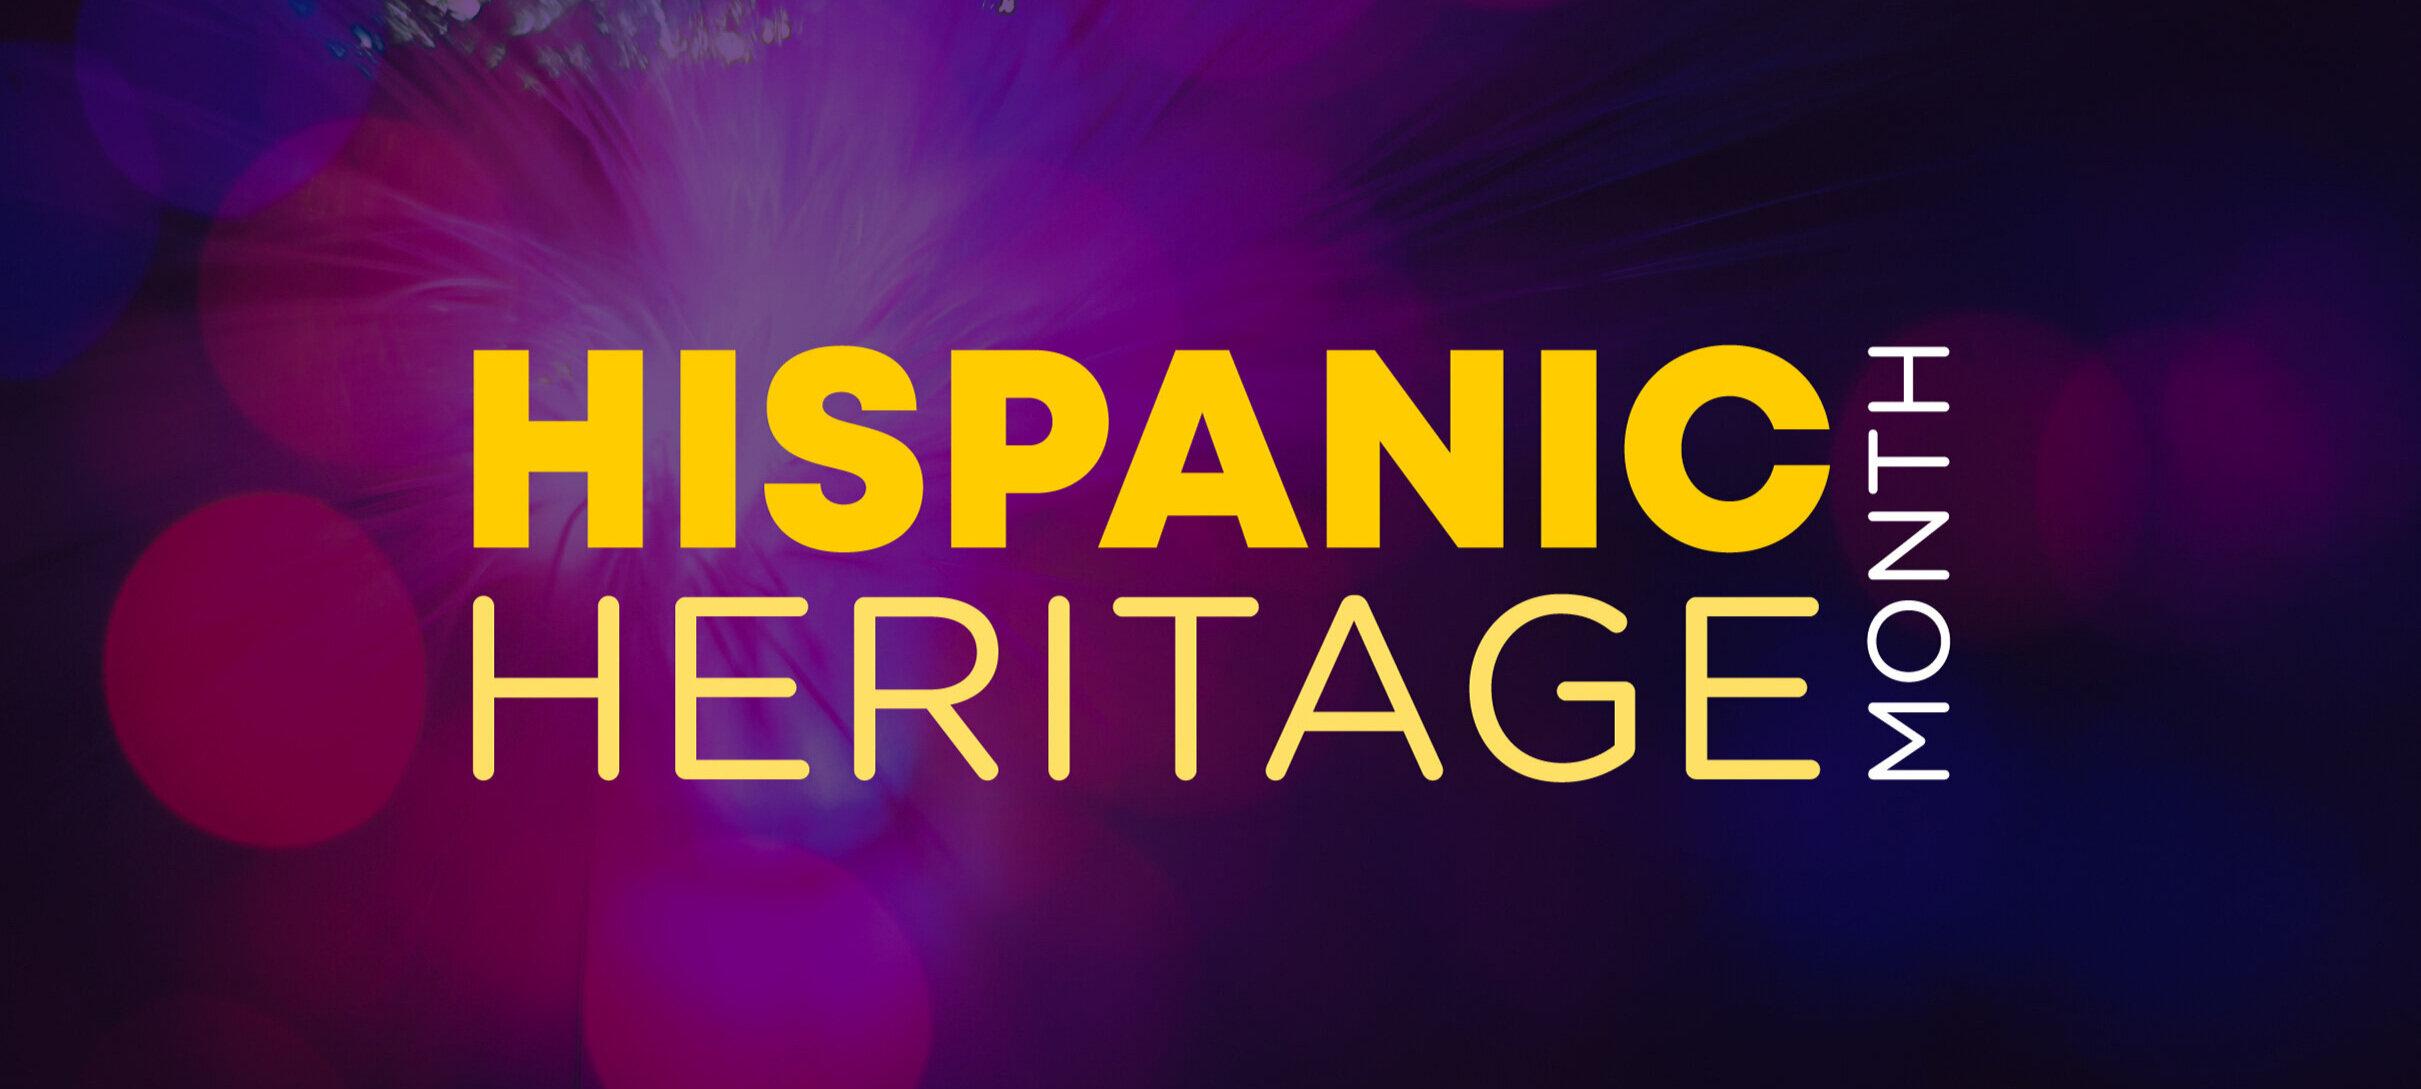 Hispanic-Heritage-Month-Turnkey Search.jpg